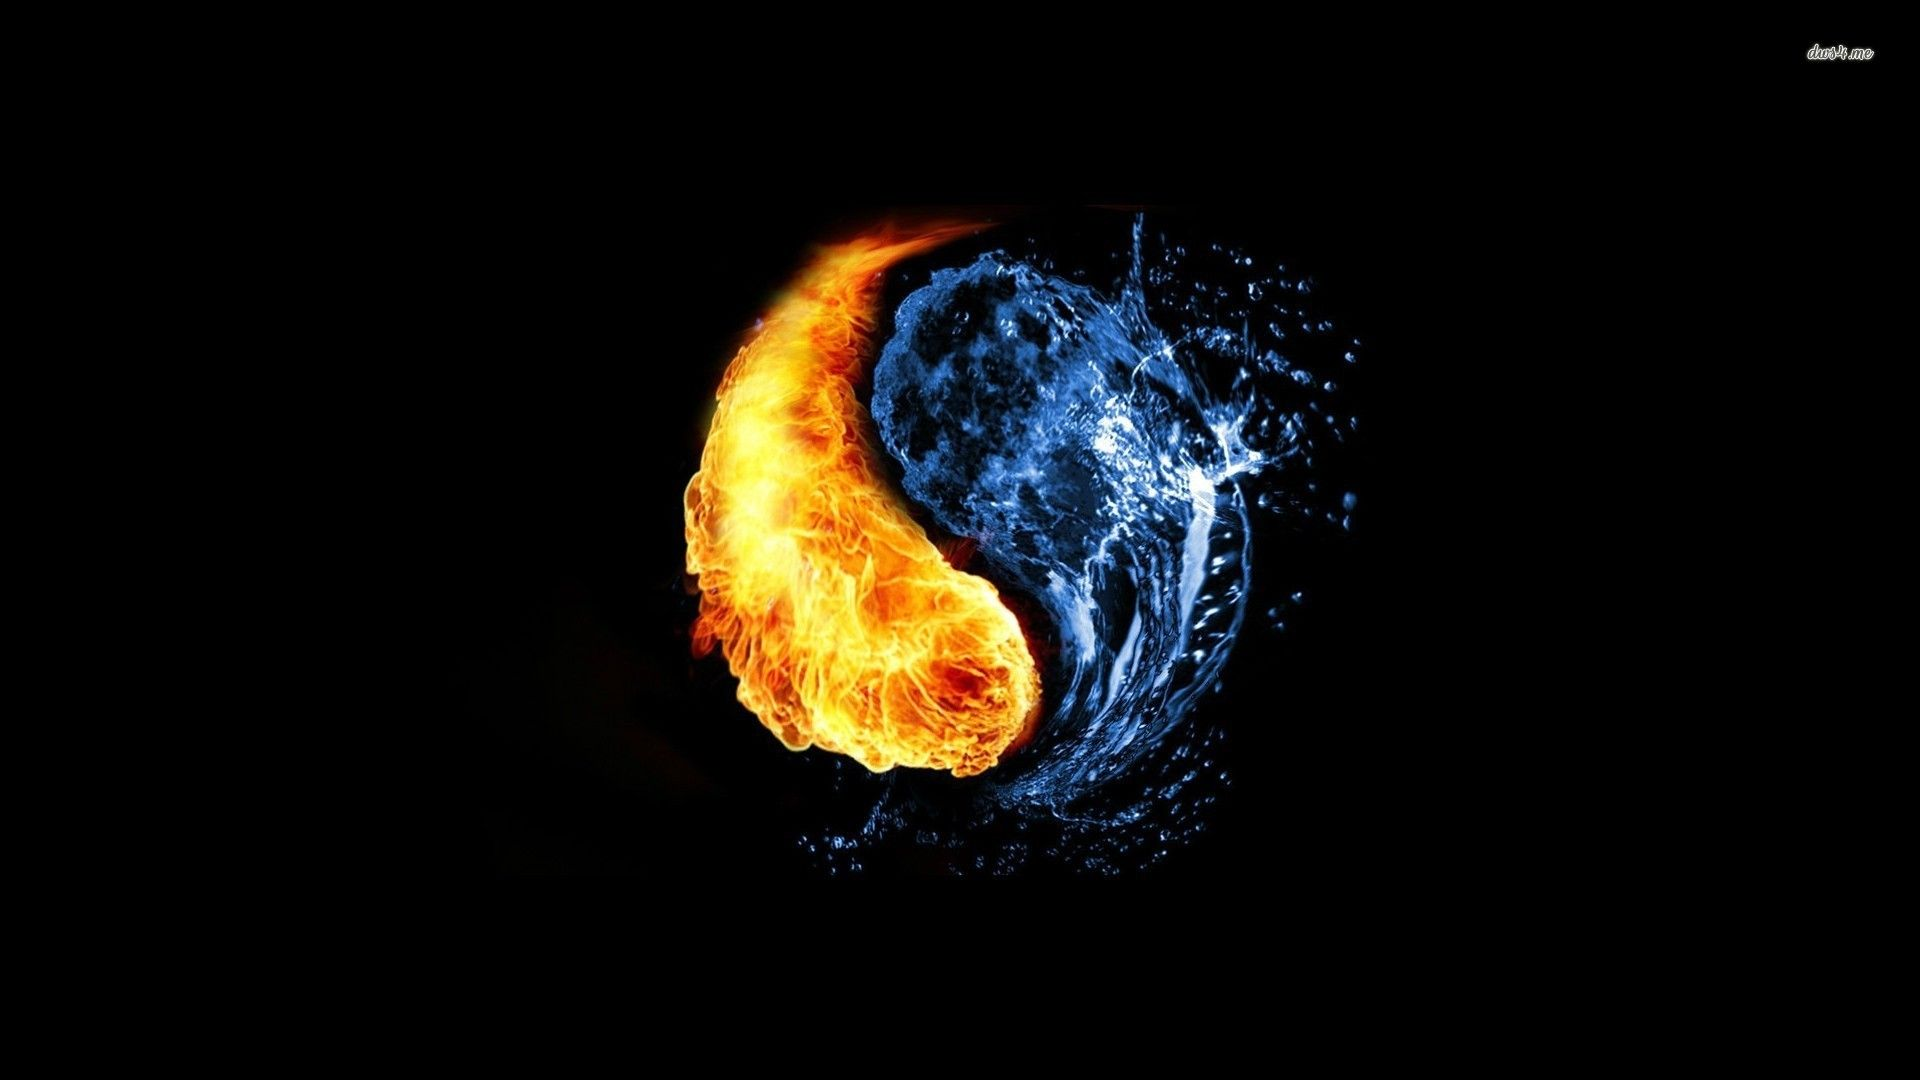 Taijitu fire water taijitu pinterest taijitu fire water biocorpaavc Choice Image